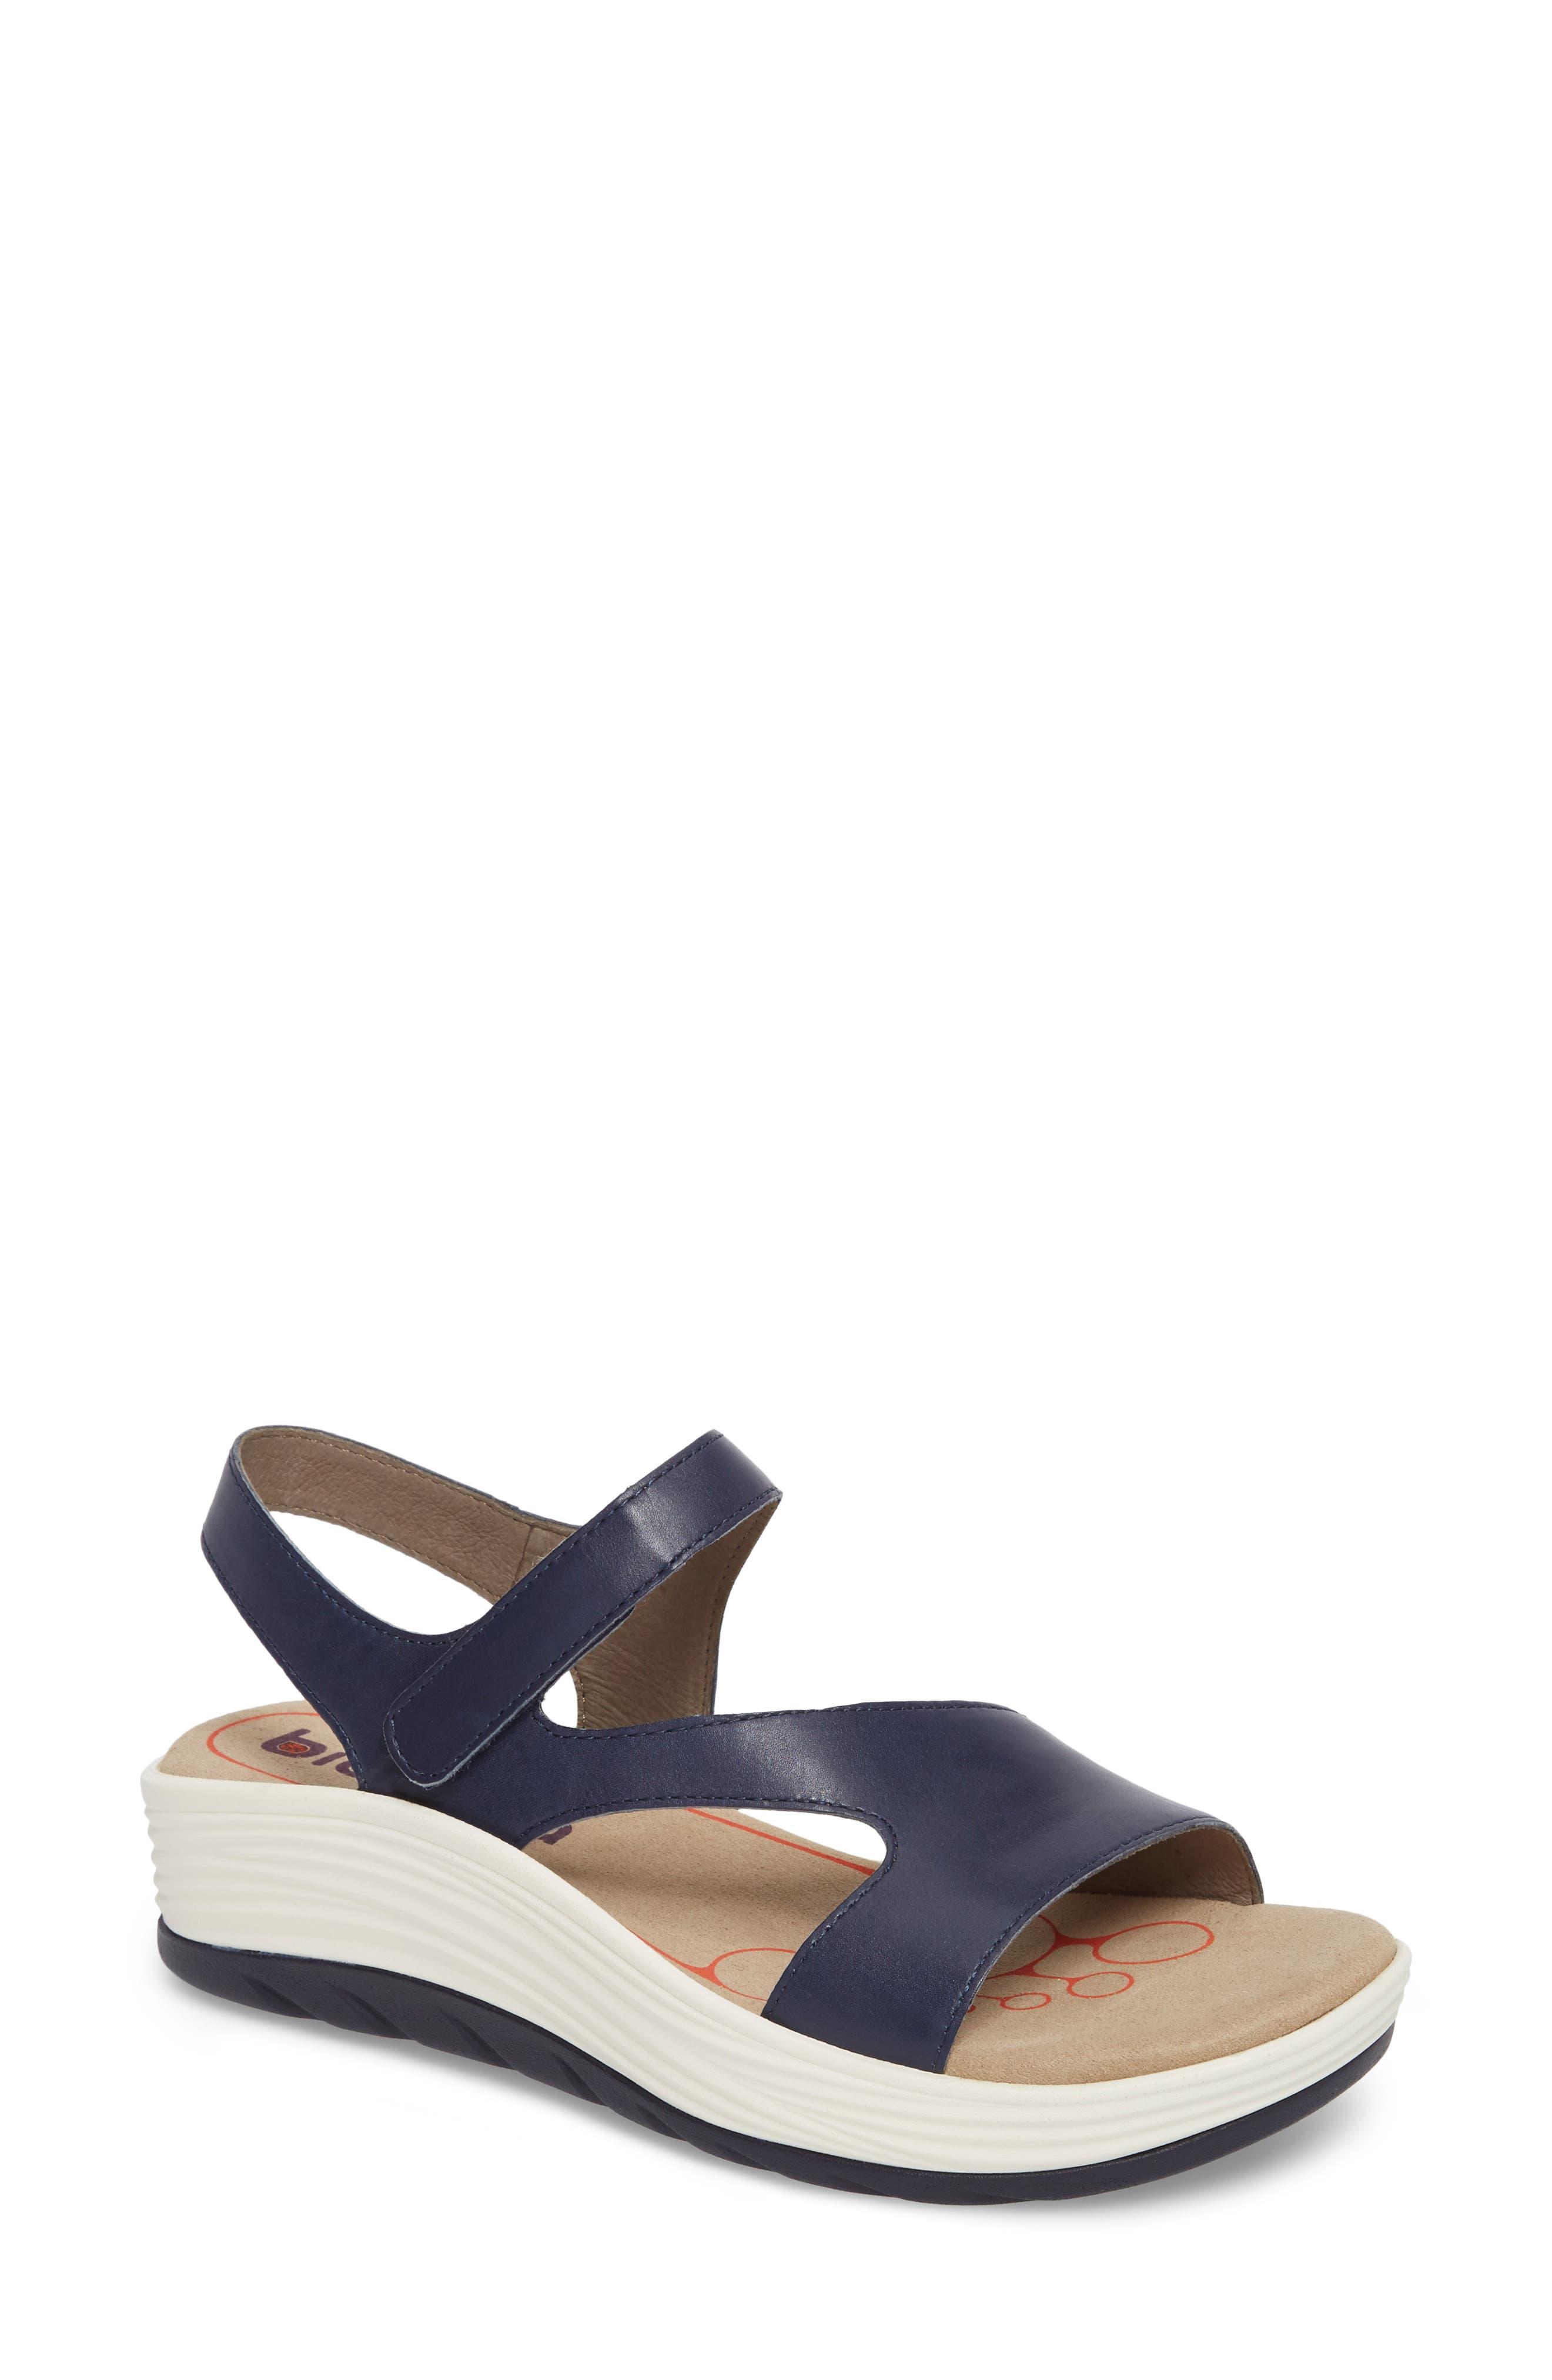 Cybele Platform Sandal,                             Main thumbnail 1, color,                             PEACOAT NAVY LEATHER